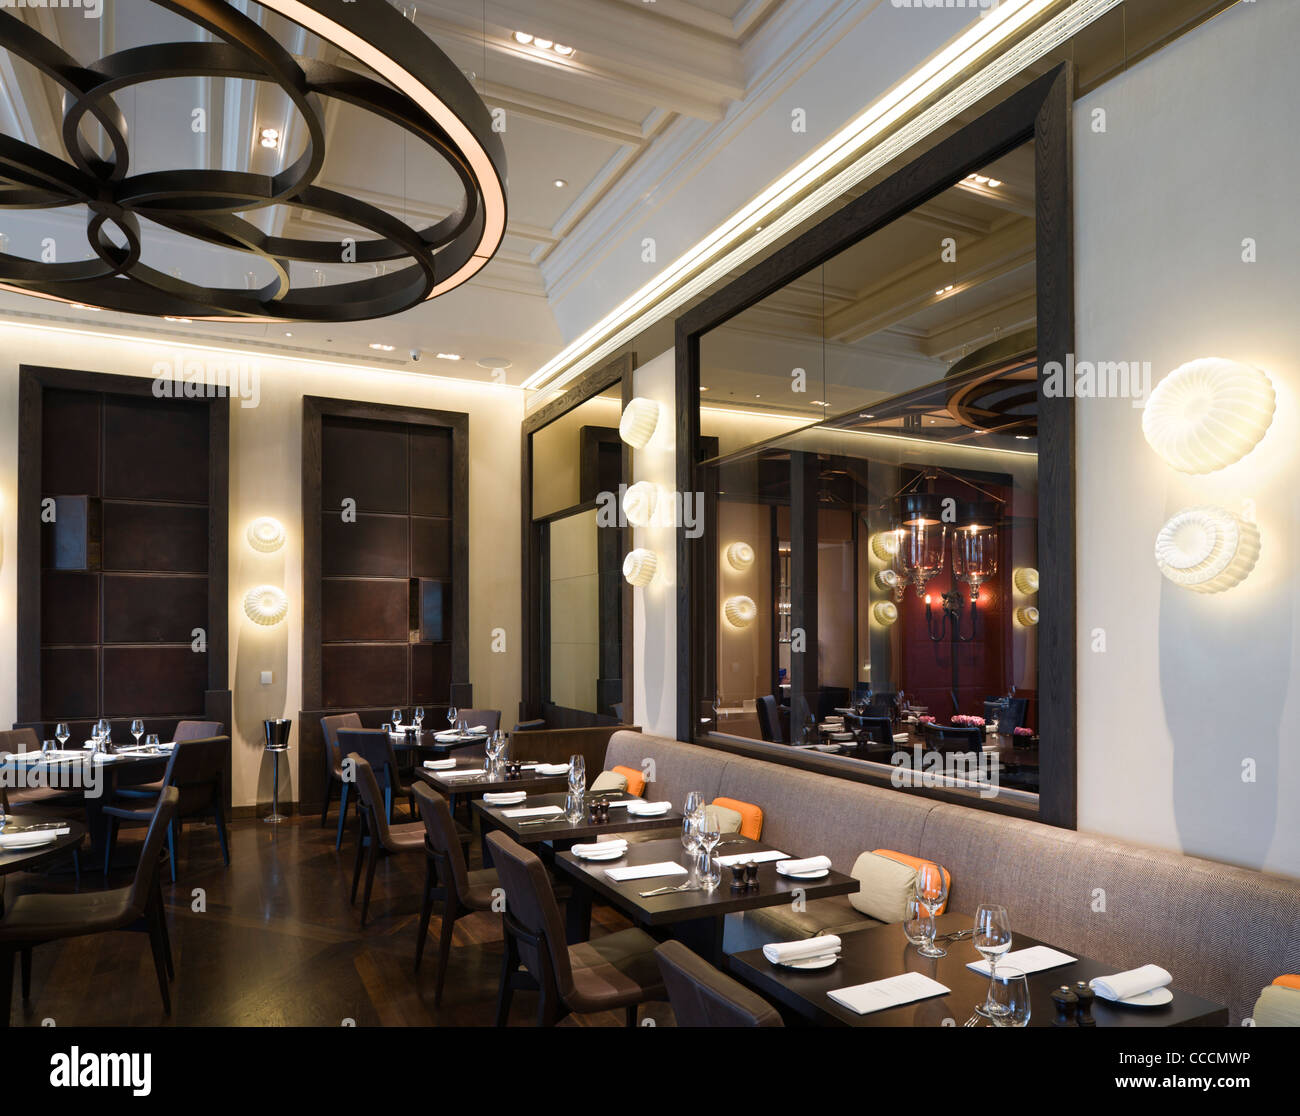 Dinner heston blumenthal restaurant mandarin oriental hotel stock photo royalty free image - Hotel mandarin restaurante ...